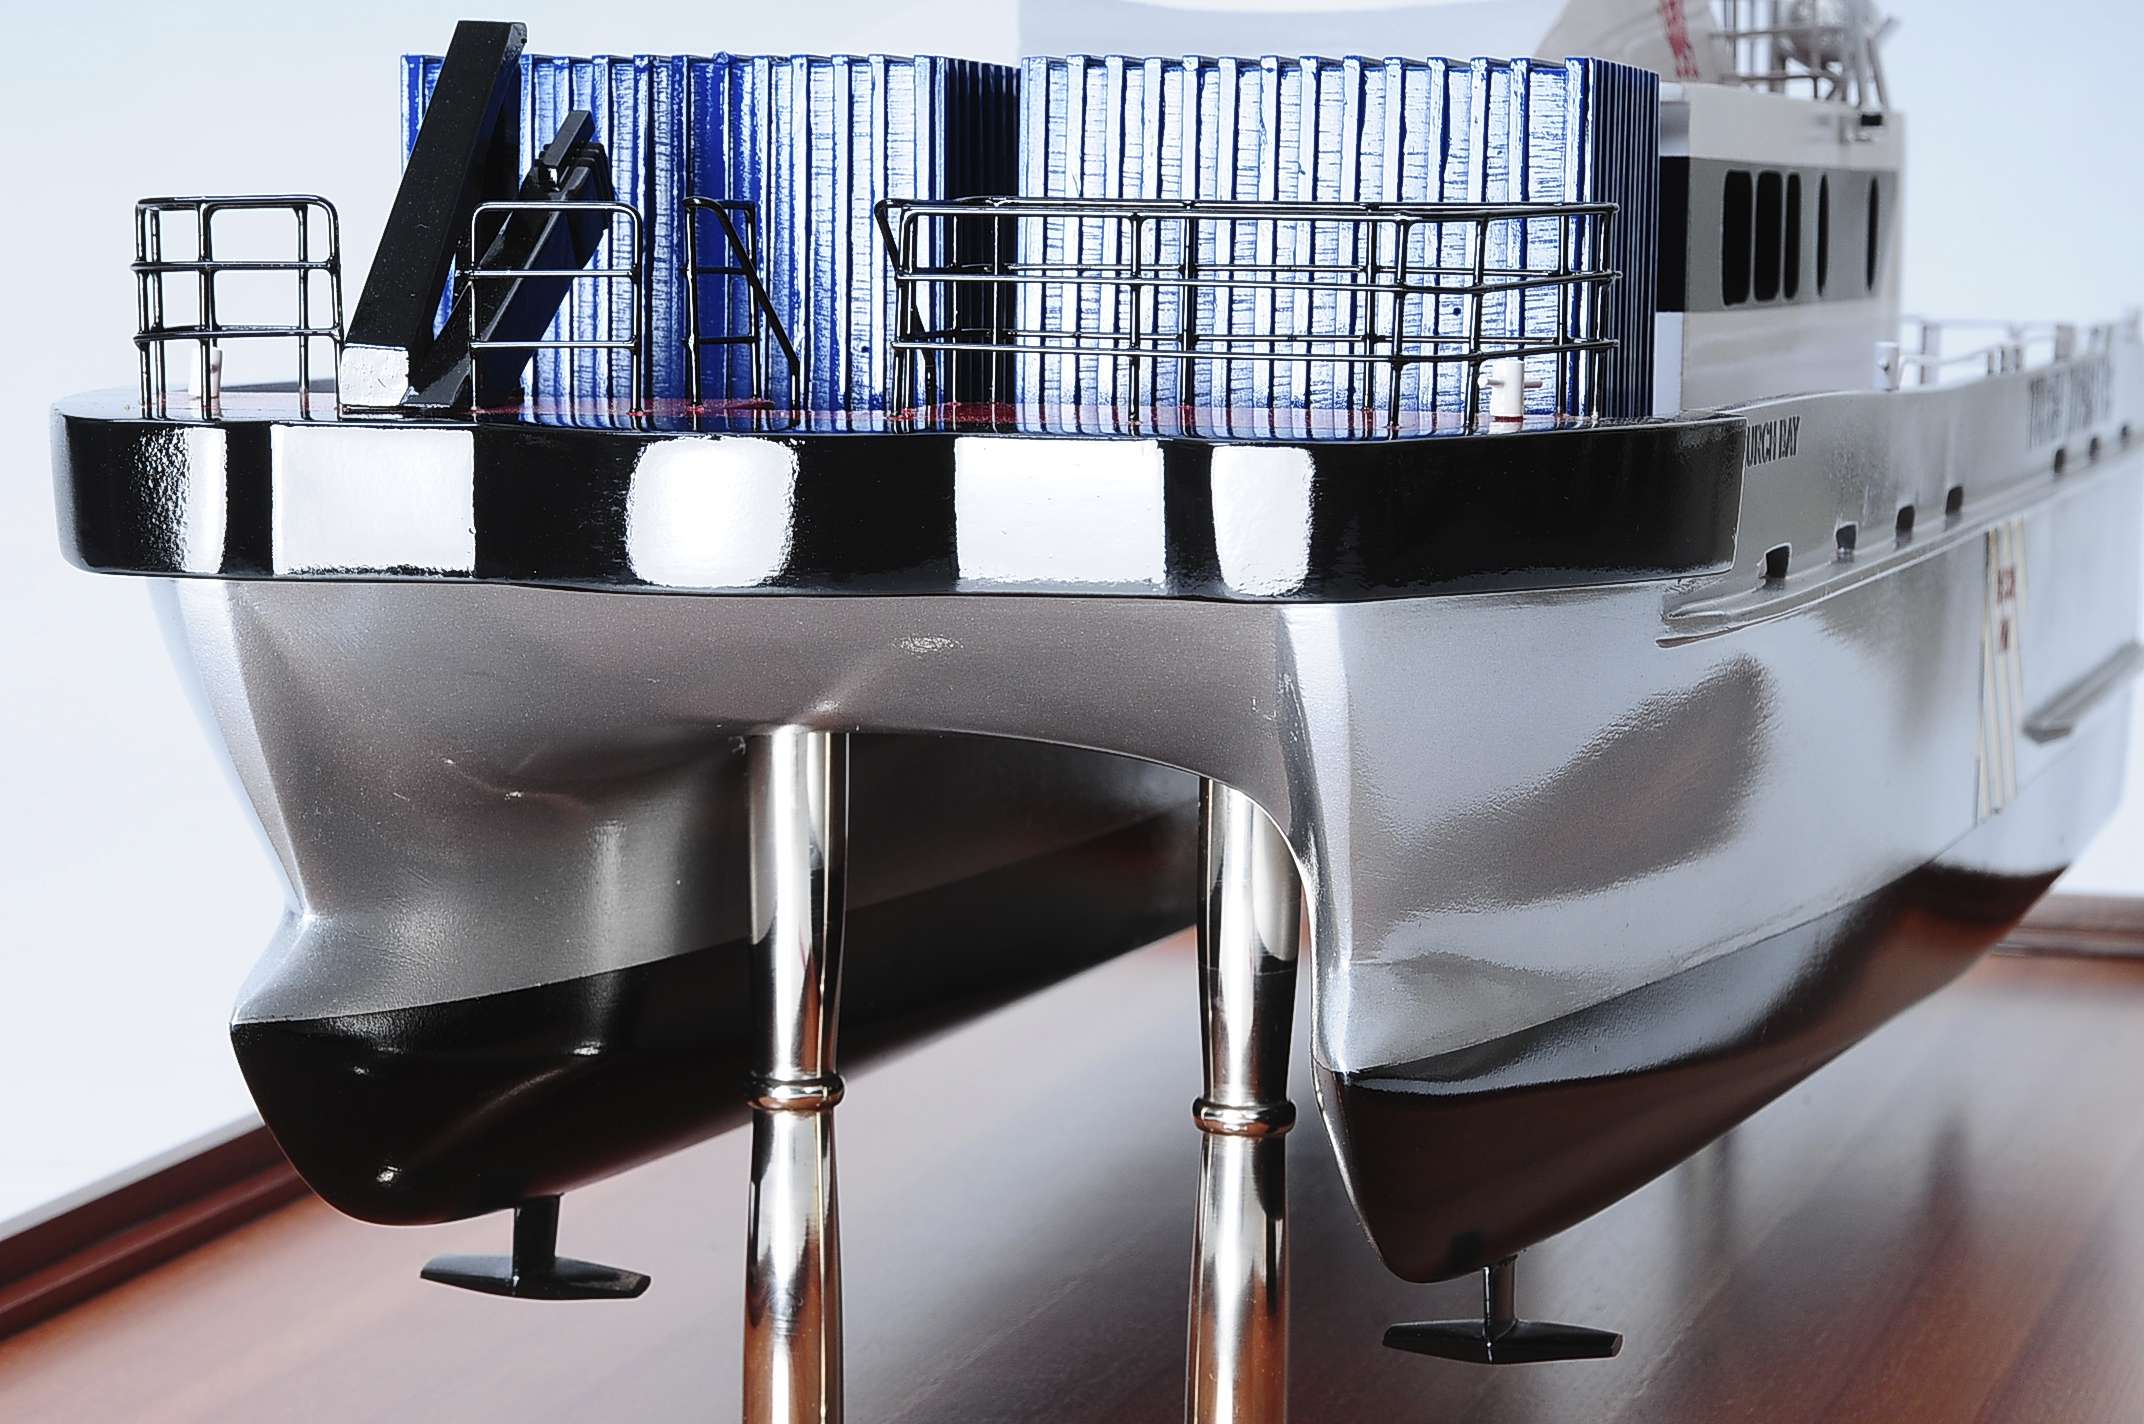 1439-4942-Turbine-Transfer-Catamaran-Model